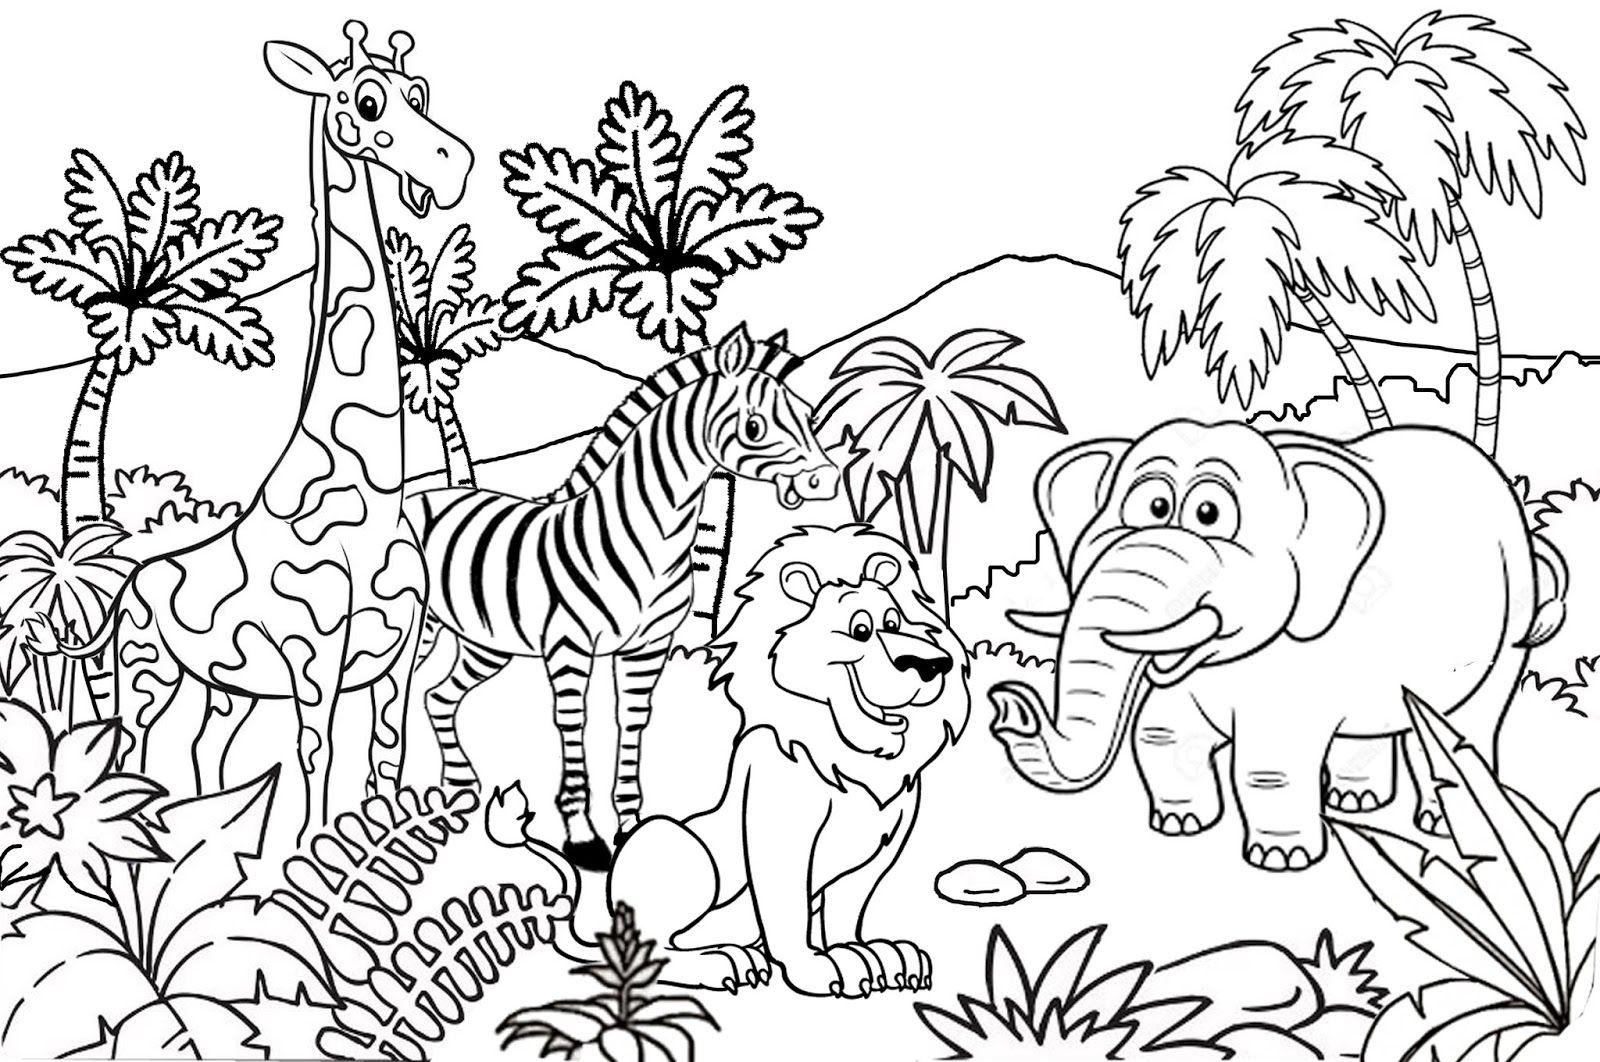 Gambar Mewarnai Kebun Binatang   Info Wisata Hits